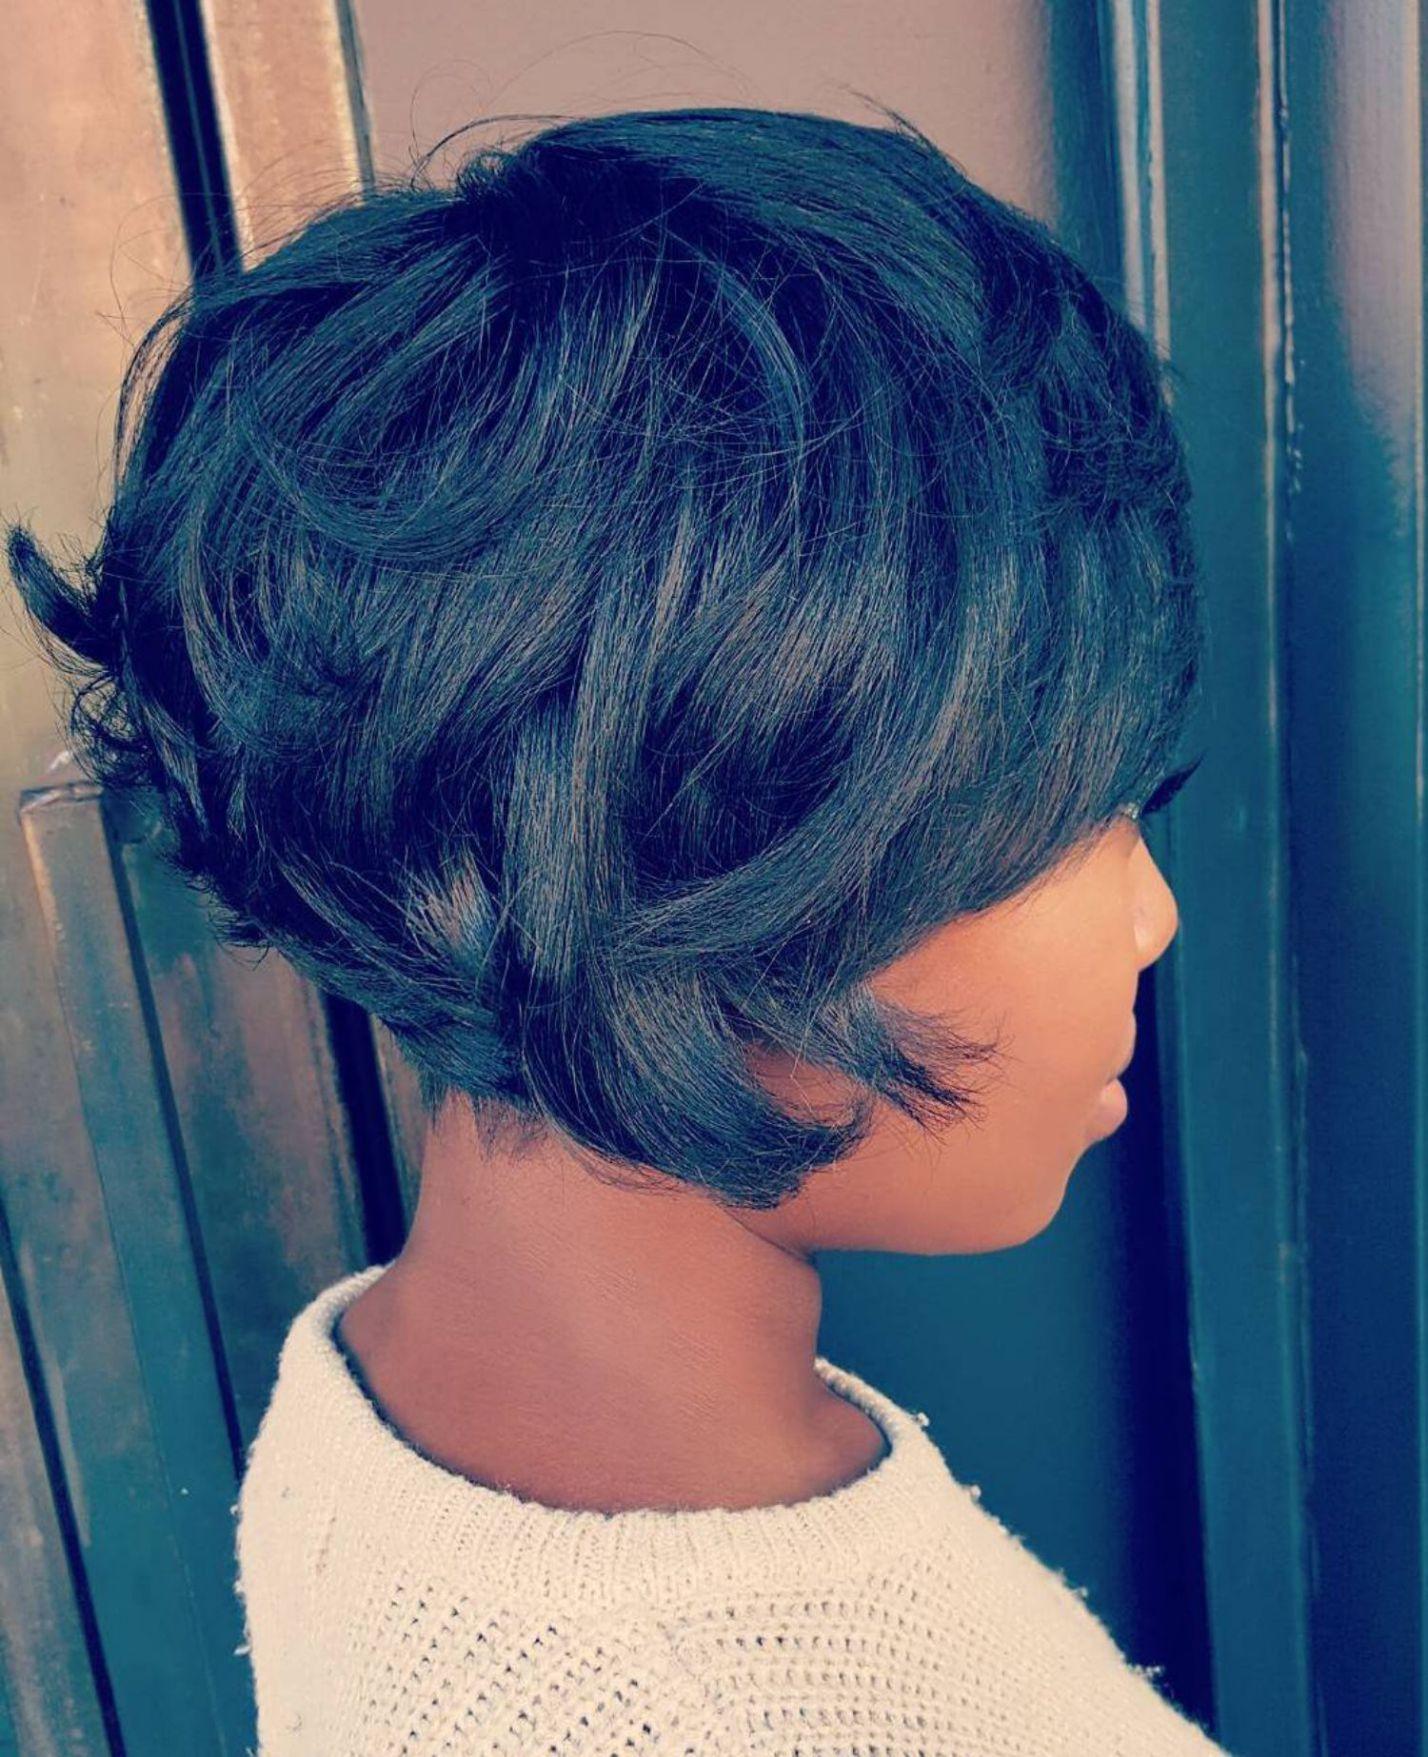 60 Great Short Hairstyles For Black Women Choppy Bob Hairstyles